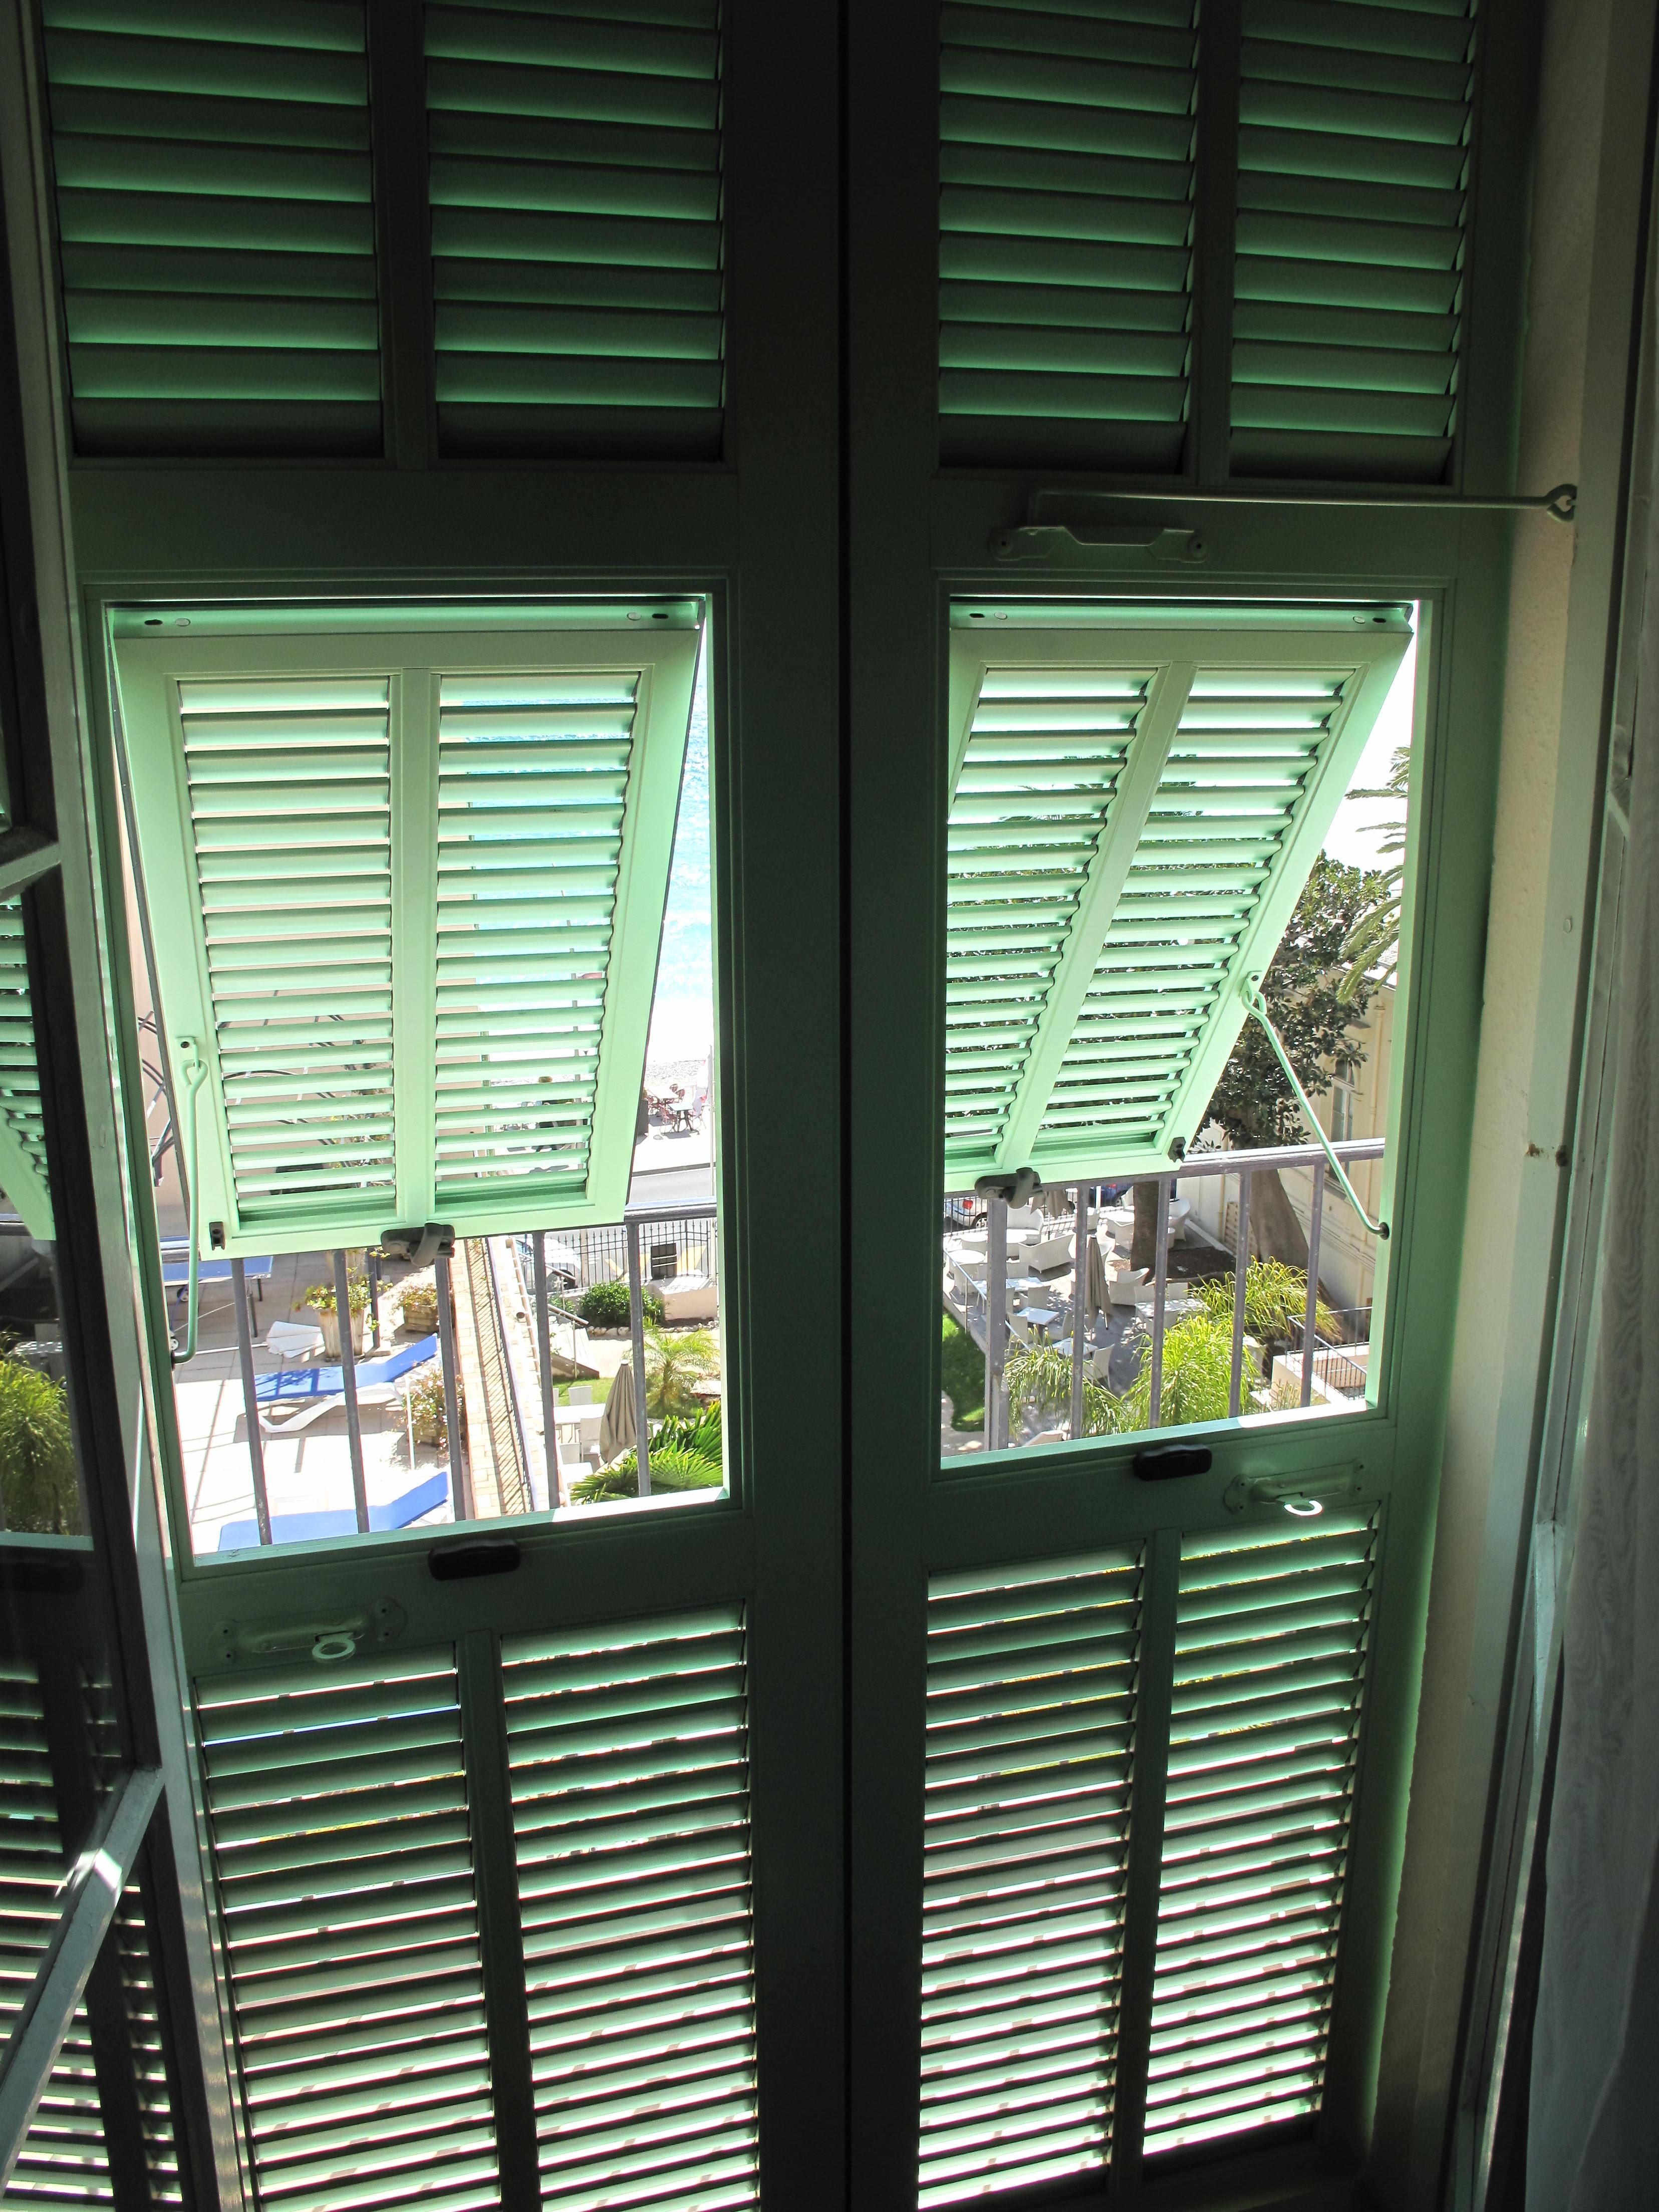 File Provencal shutters interior Wikimedia mons